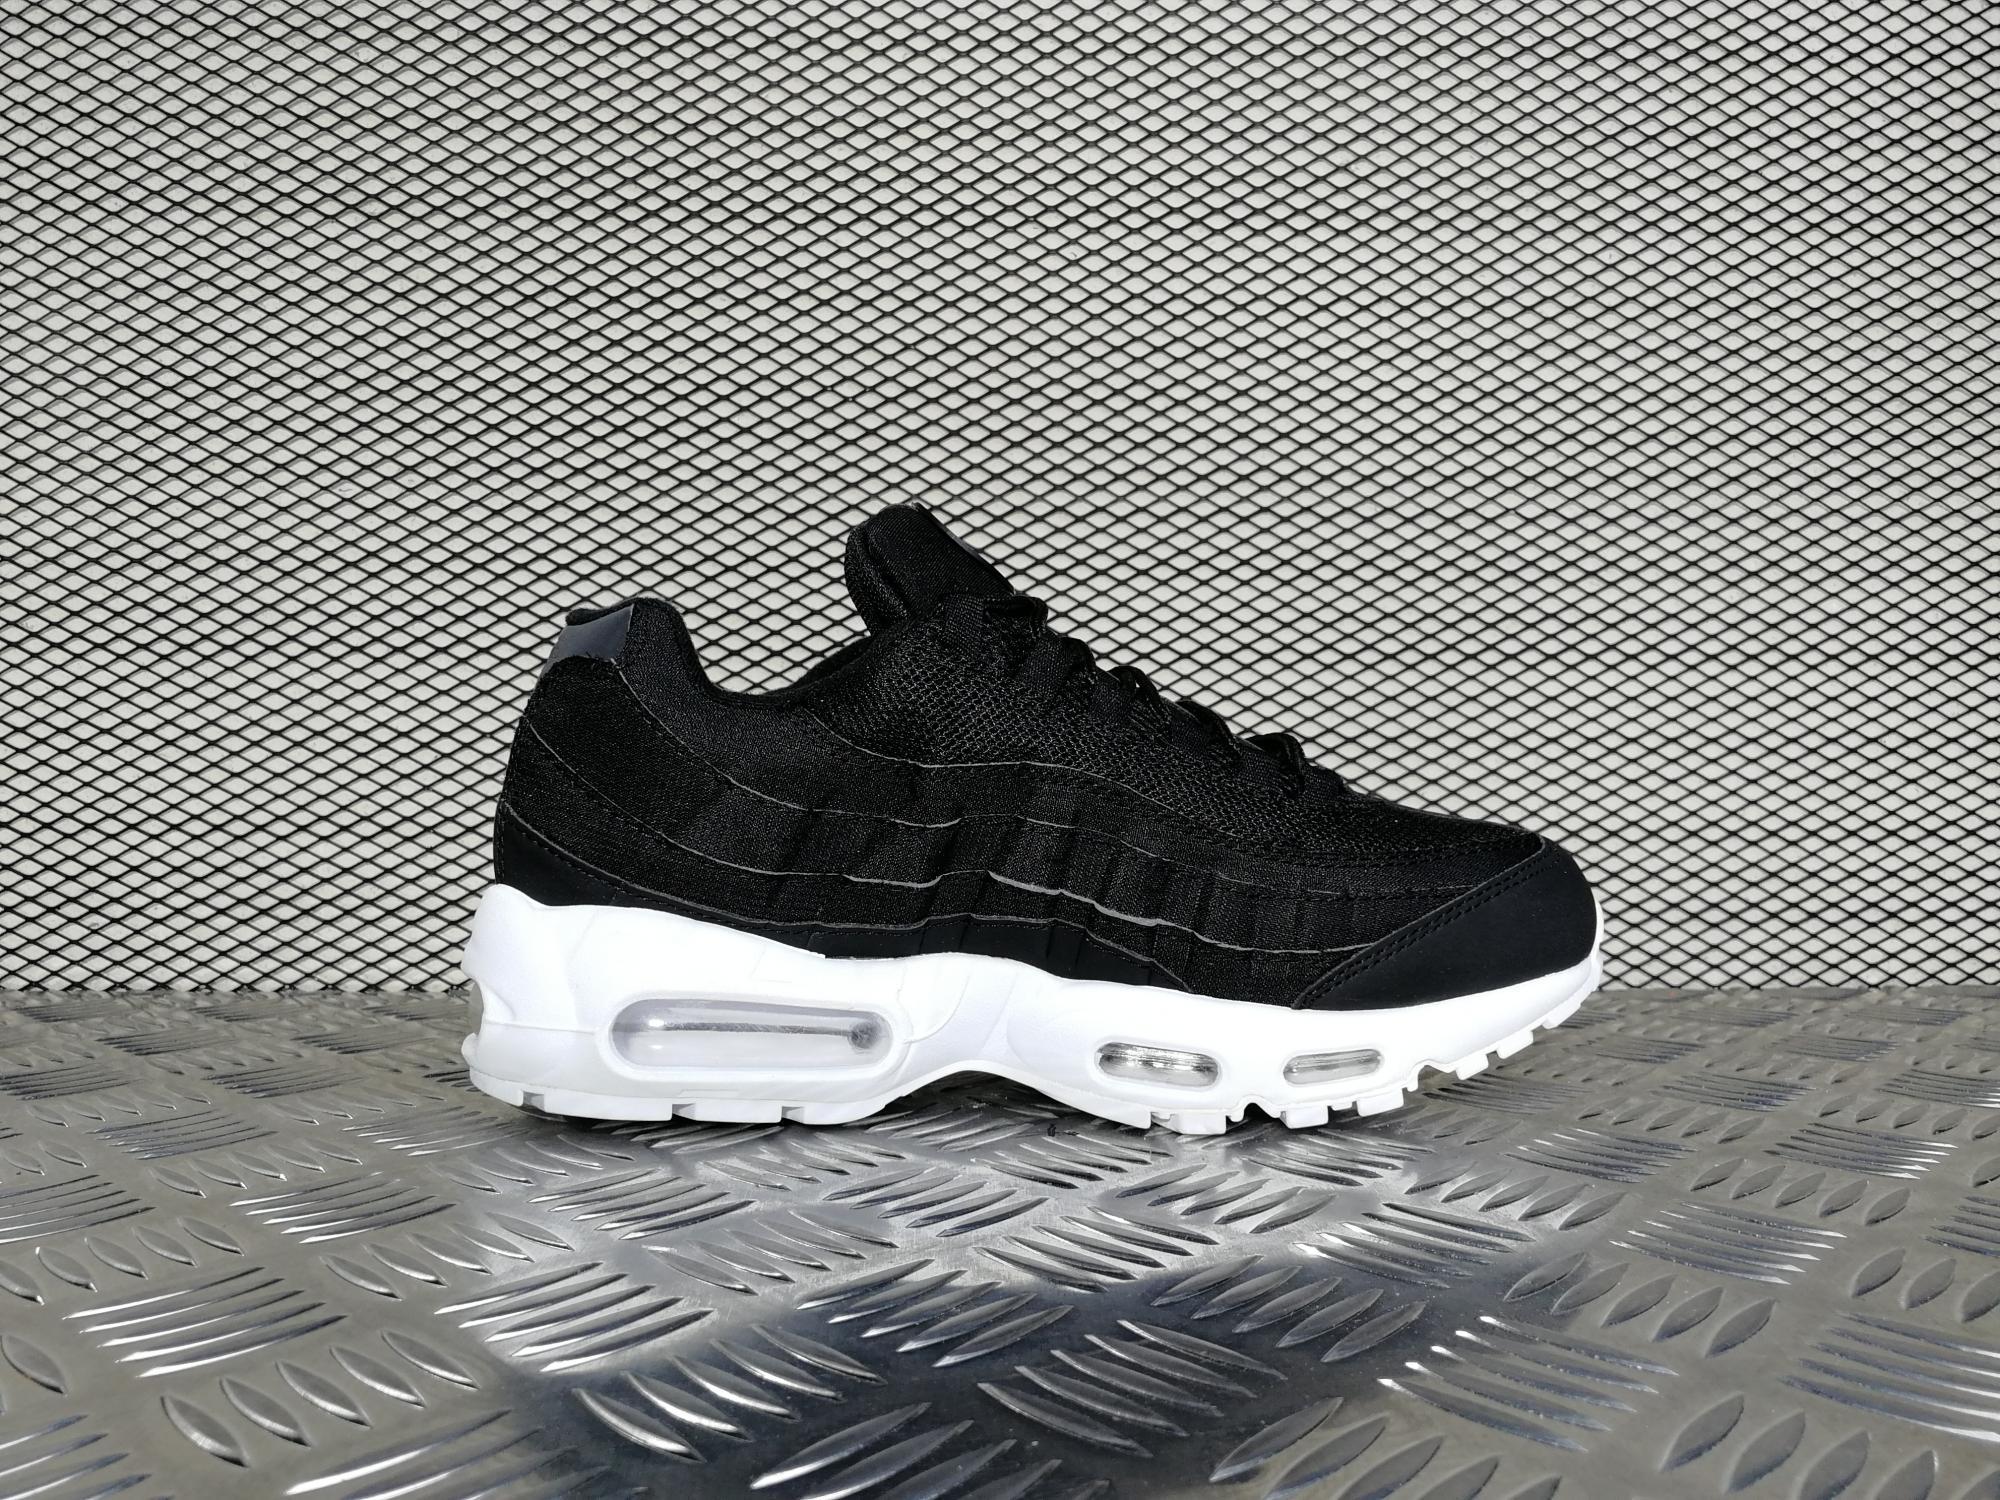 Купить мужские кроссовки Nike Air Max 95 X Stussy Black   White в ... a56b04616fa